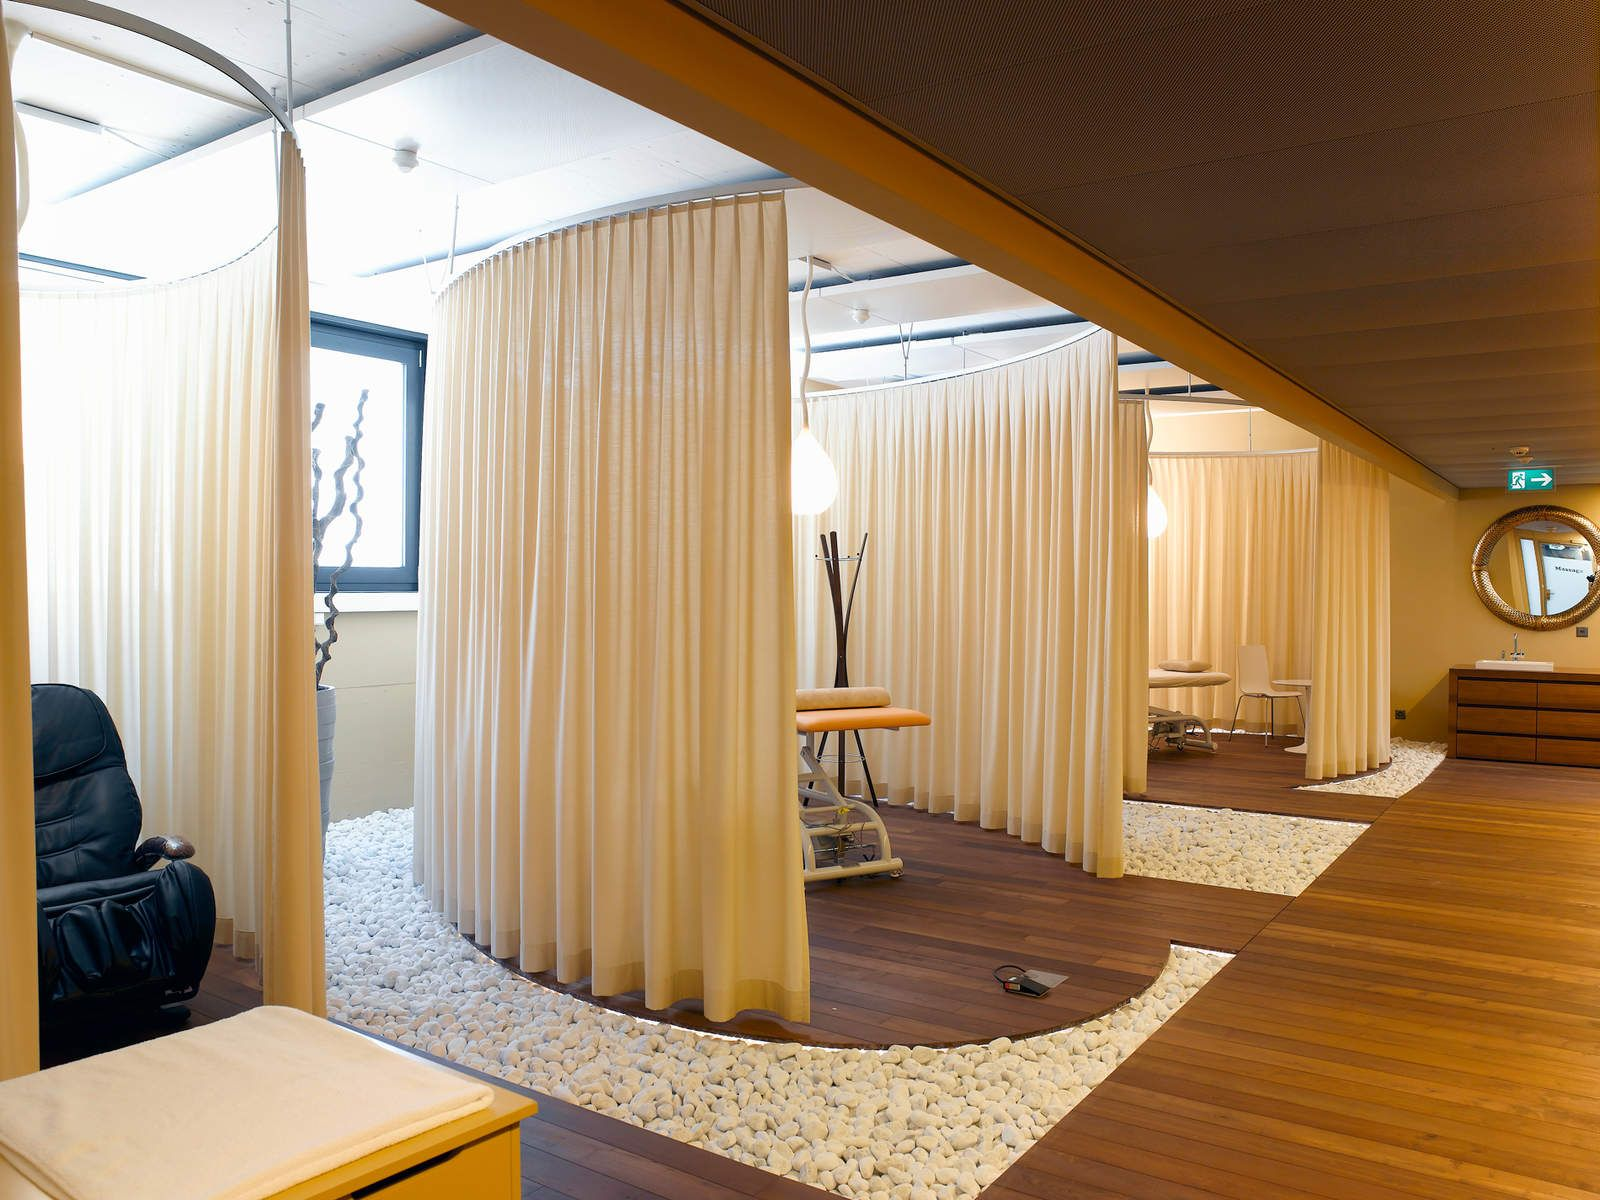 Google Hub Zurich Google Office Evolution Design Camenzind Evolution Interior De Spa Decoracion De Cabina Cabina De Masaje